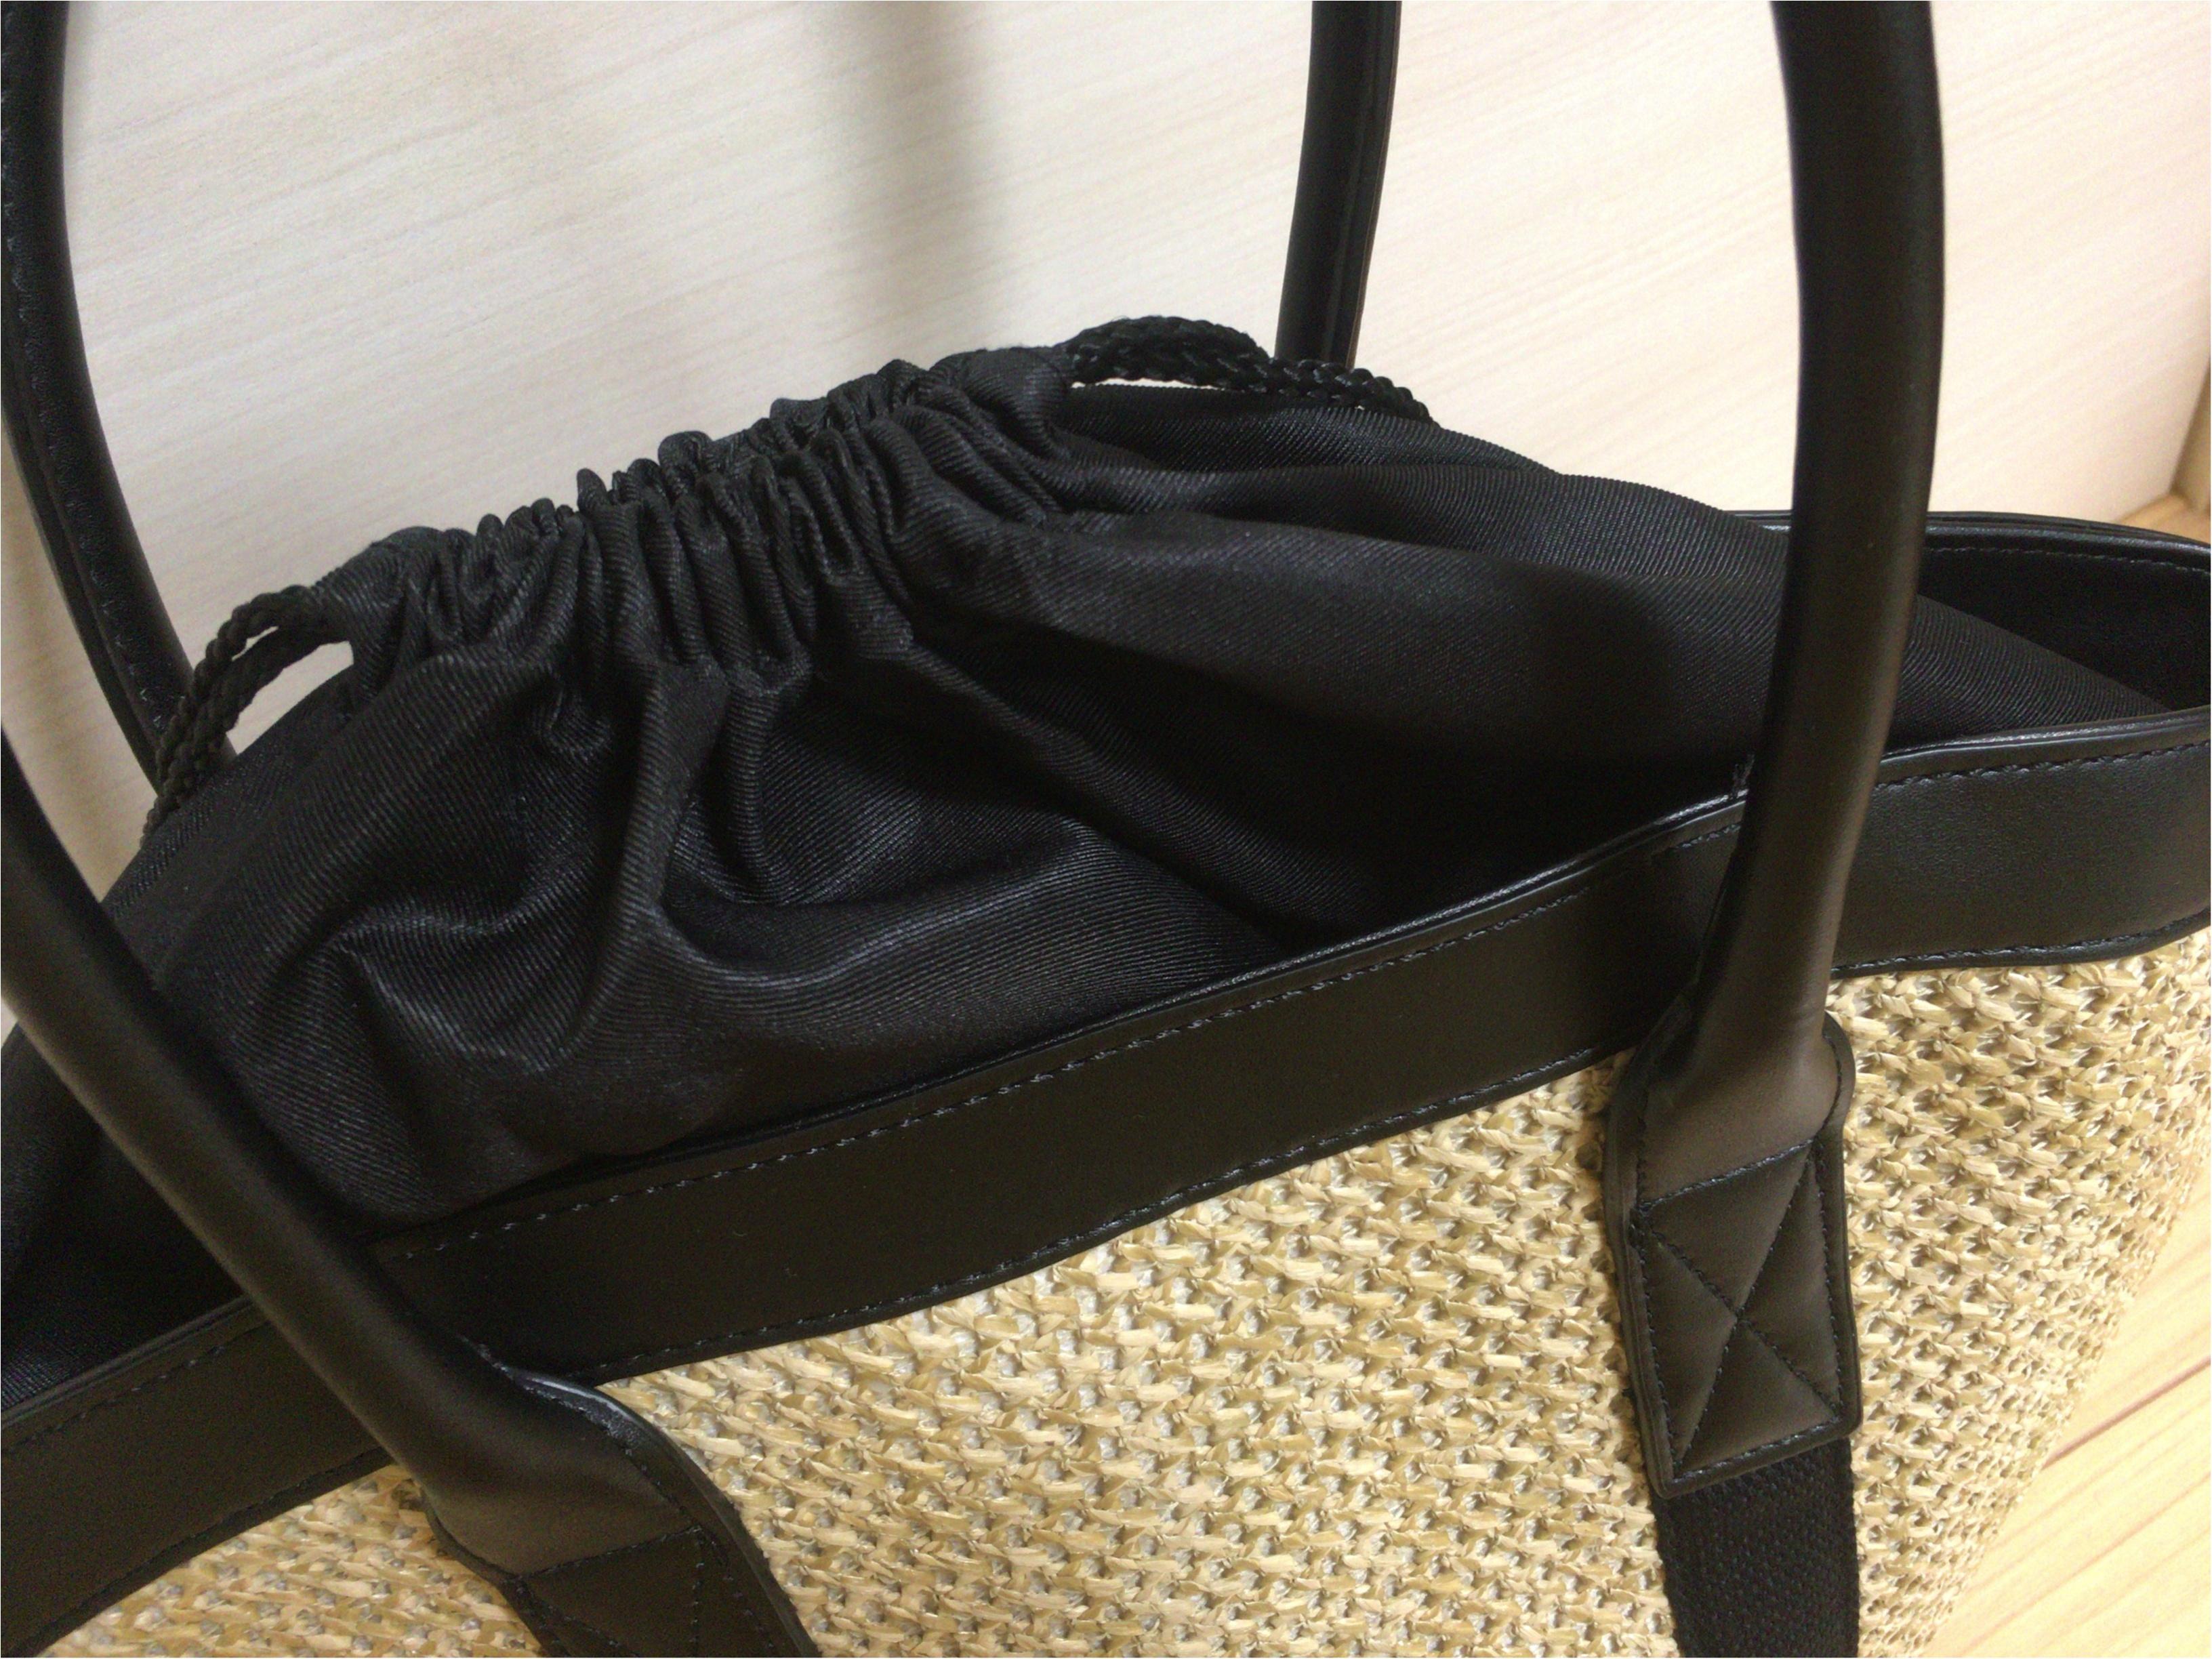 【SALE】990円!GU《カゴトートバッグ》可愛い♡夏ファッション必須アイテムをさらに安く♡_3